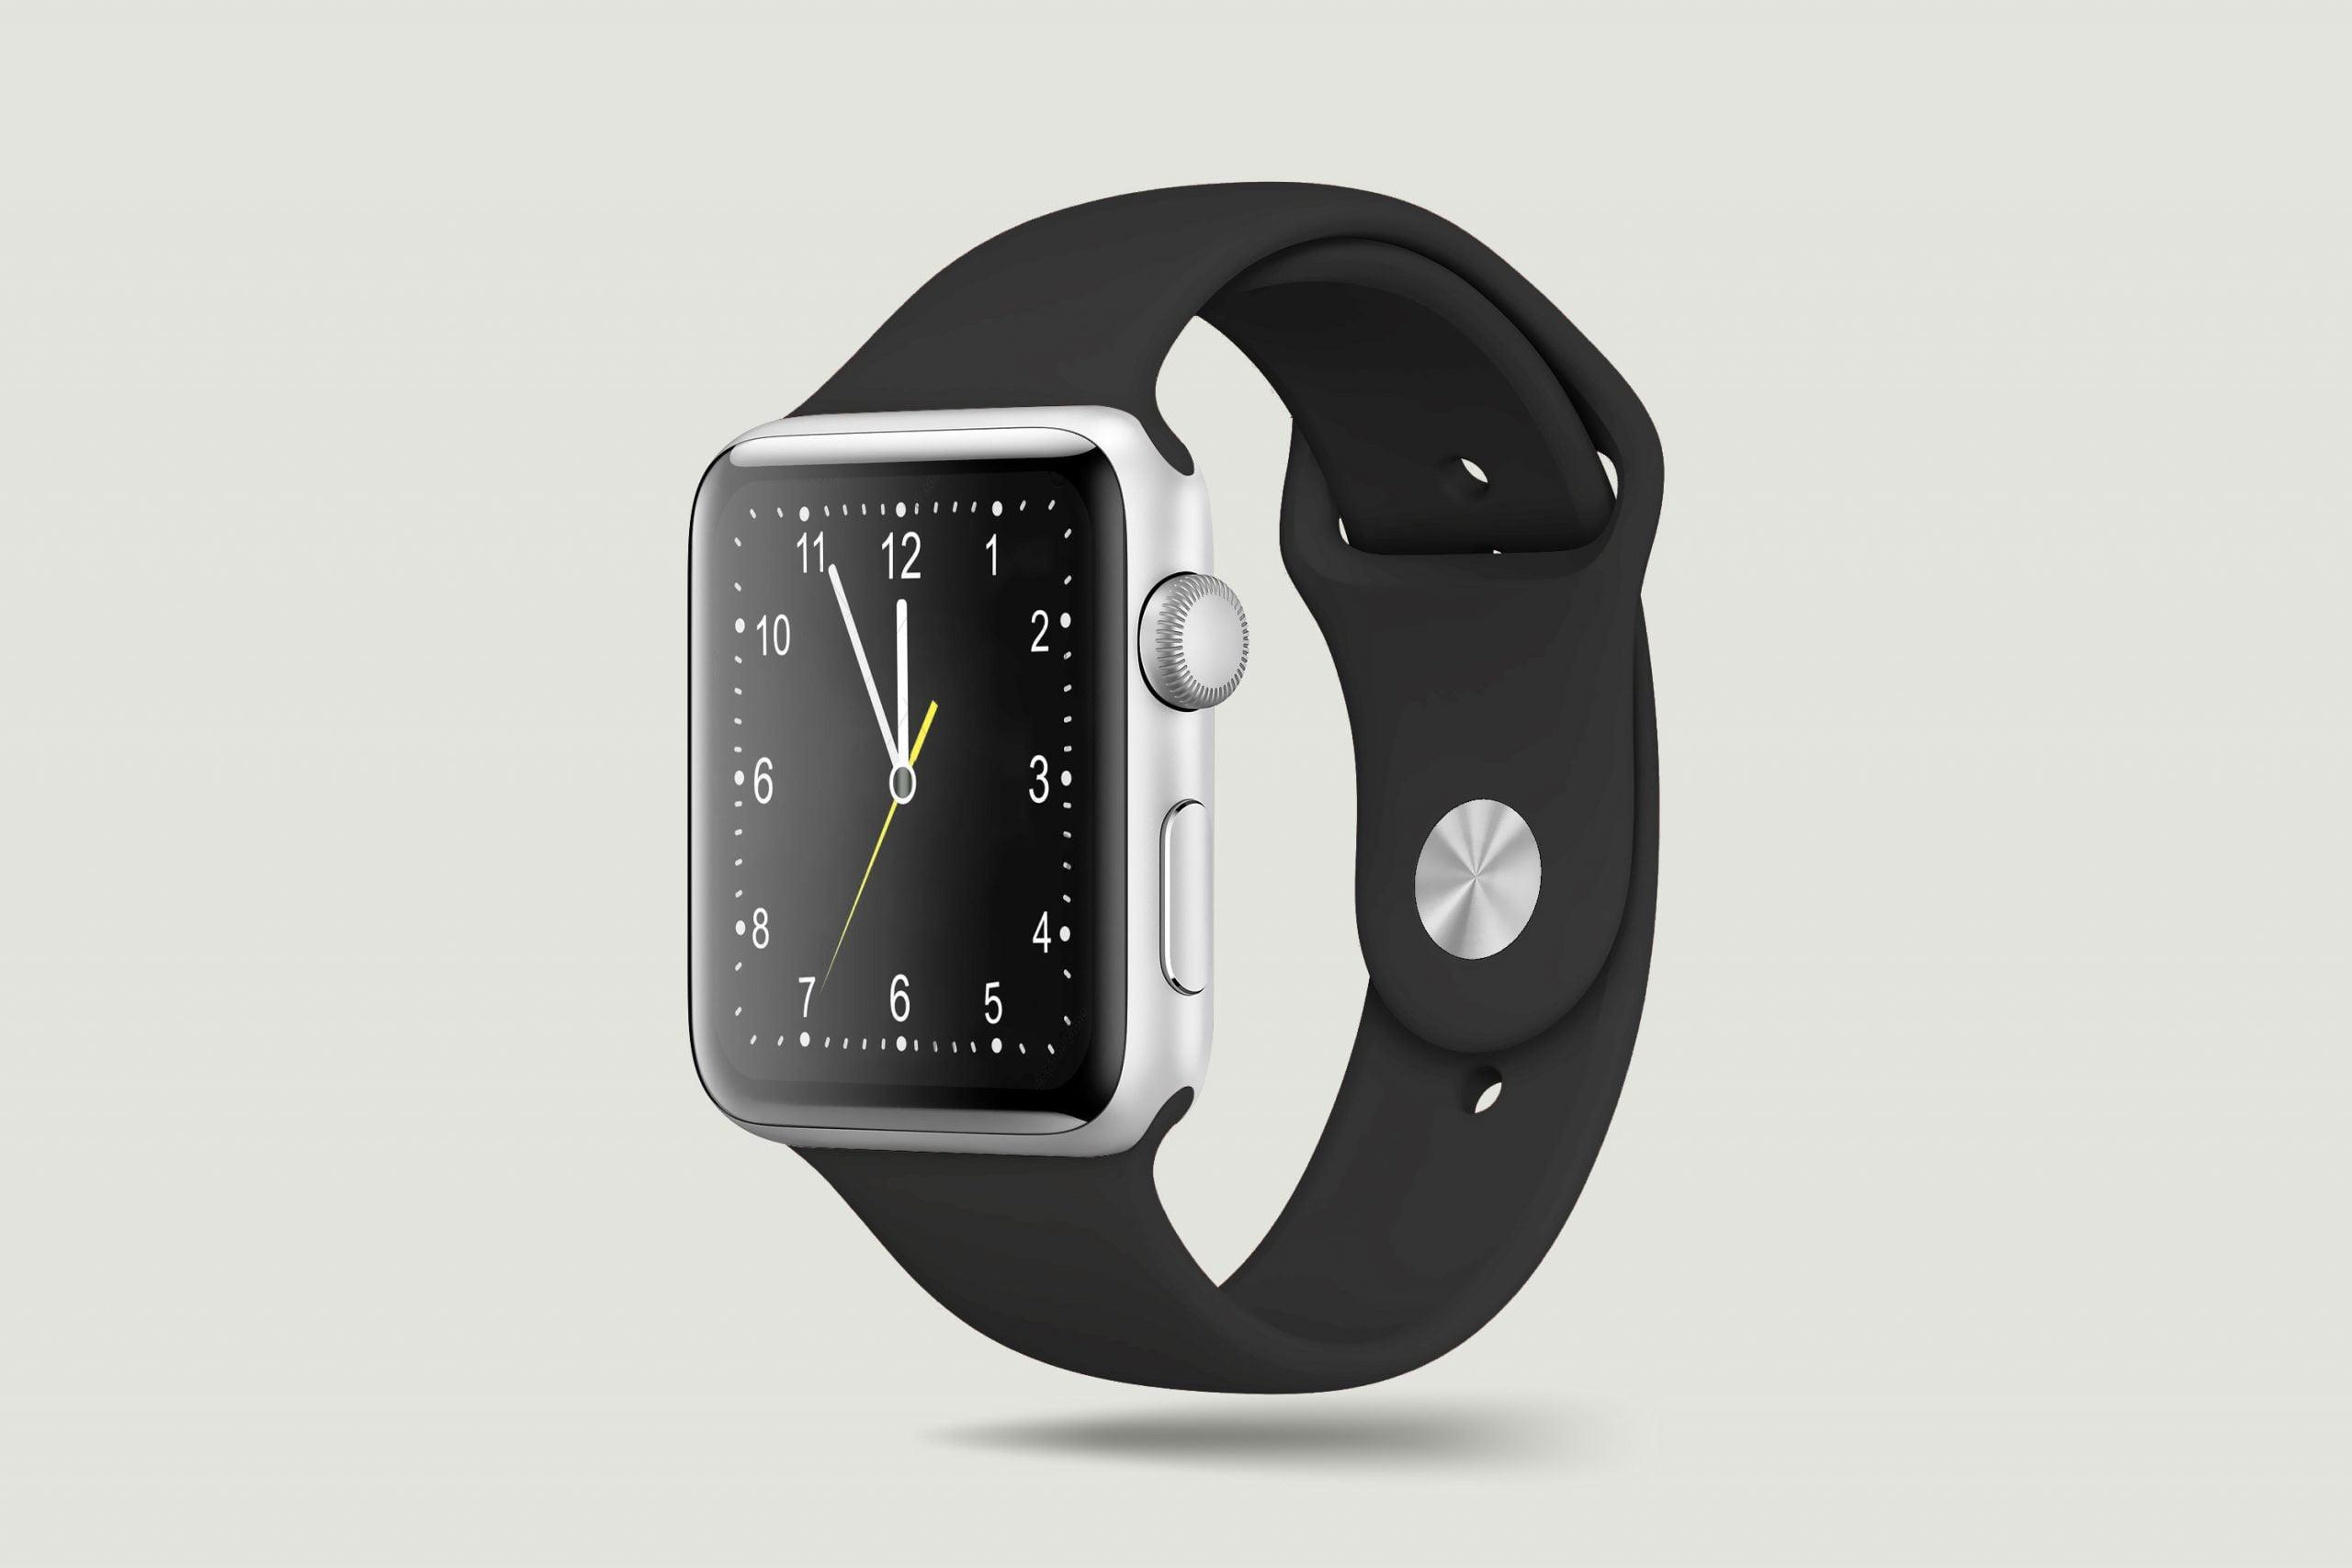 Smart Watch Mockup Design 4